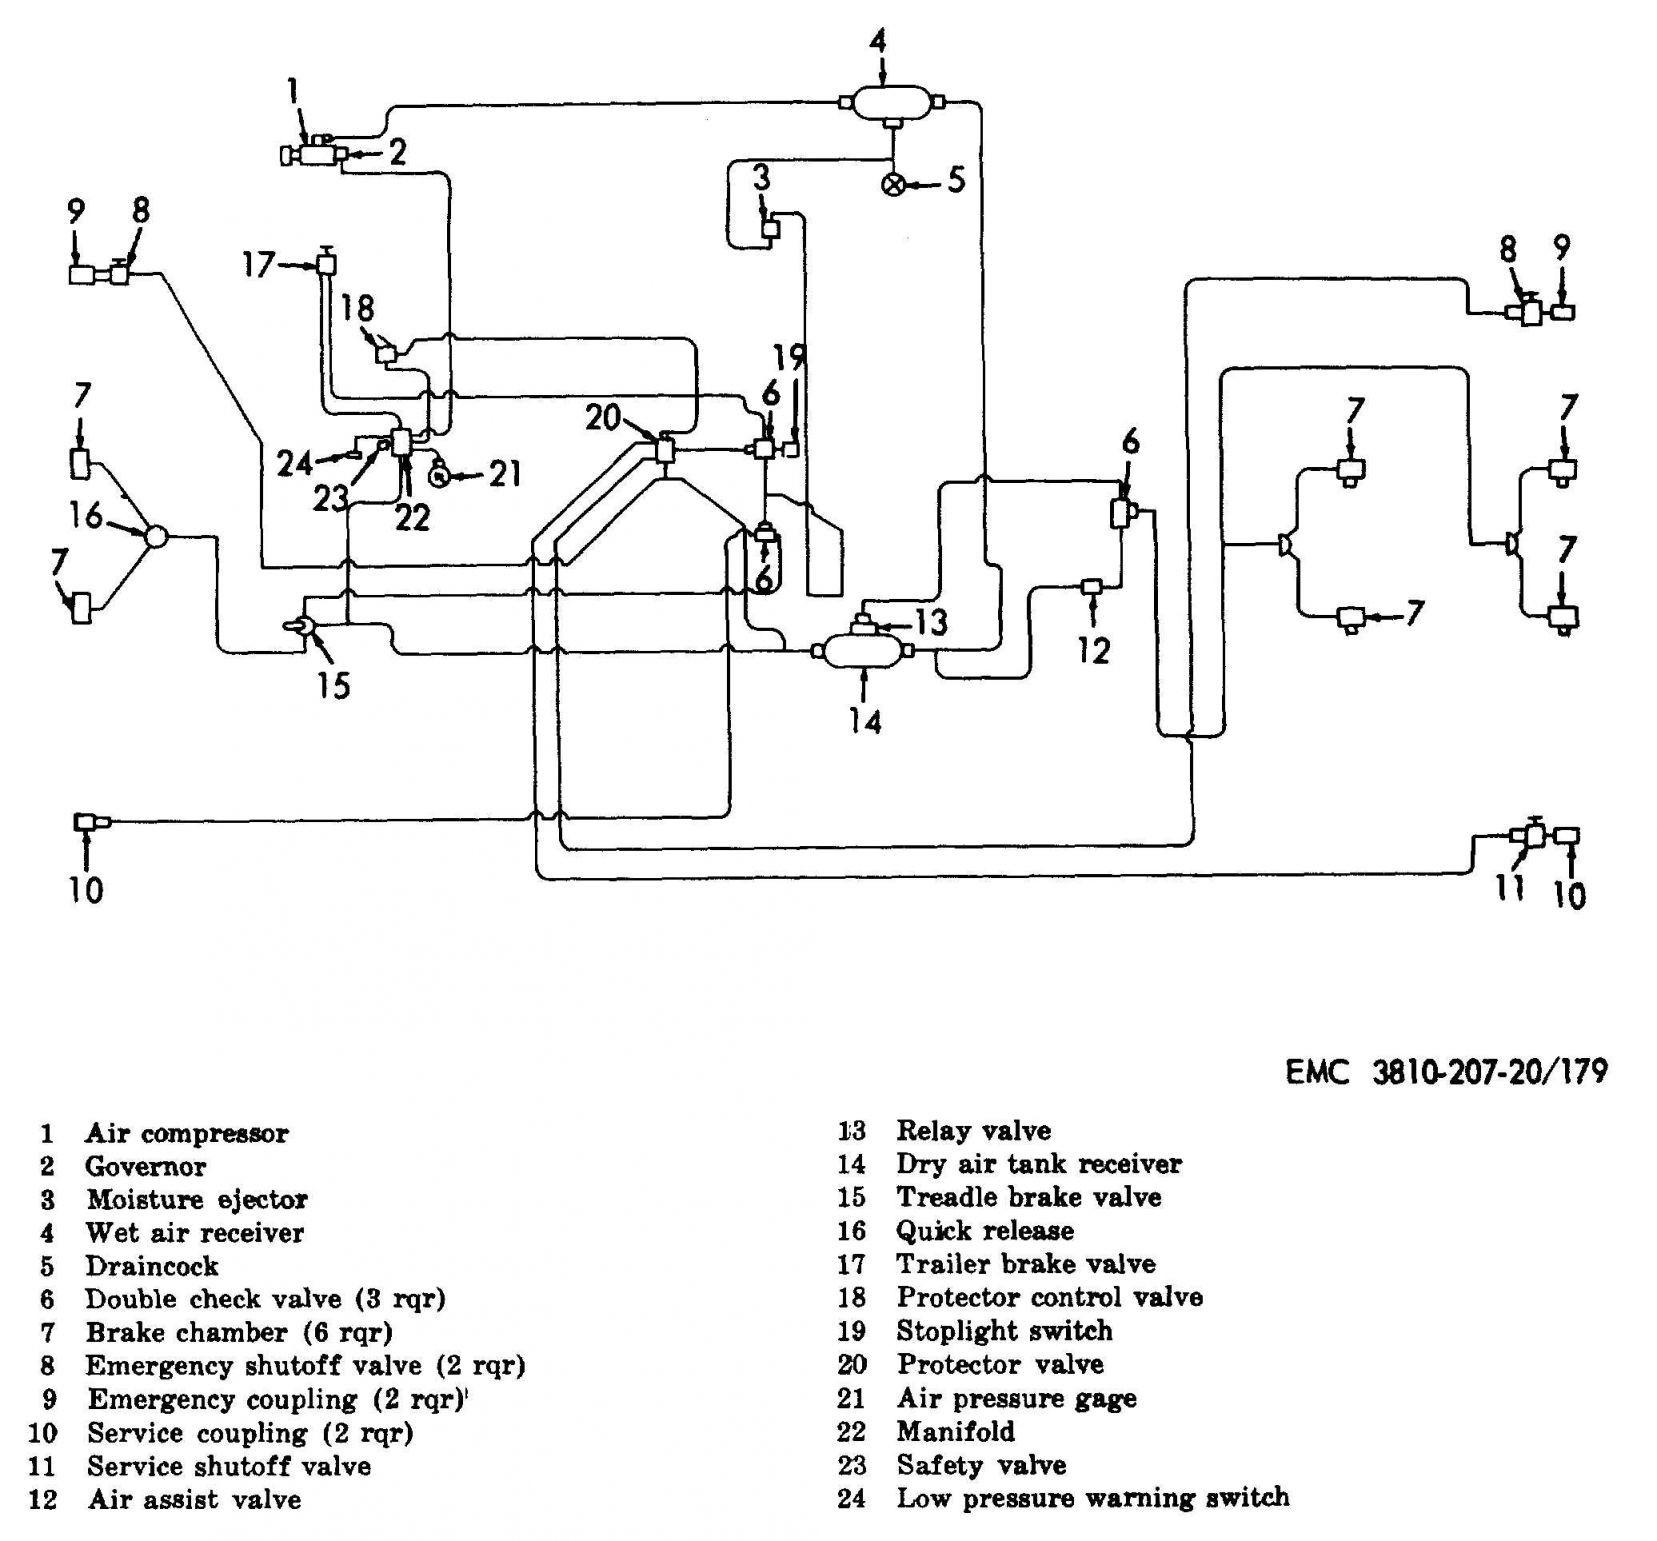 Bus Air Brake System Diagram Tractor Trailer Brake Chamber Diagram Wiring Diagram Database • Of Bus Air Brake System Diagram